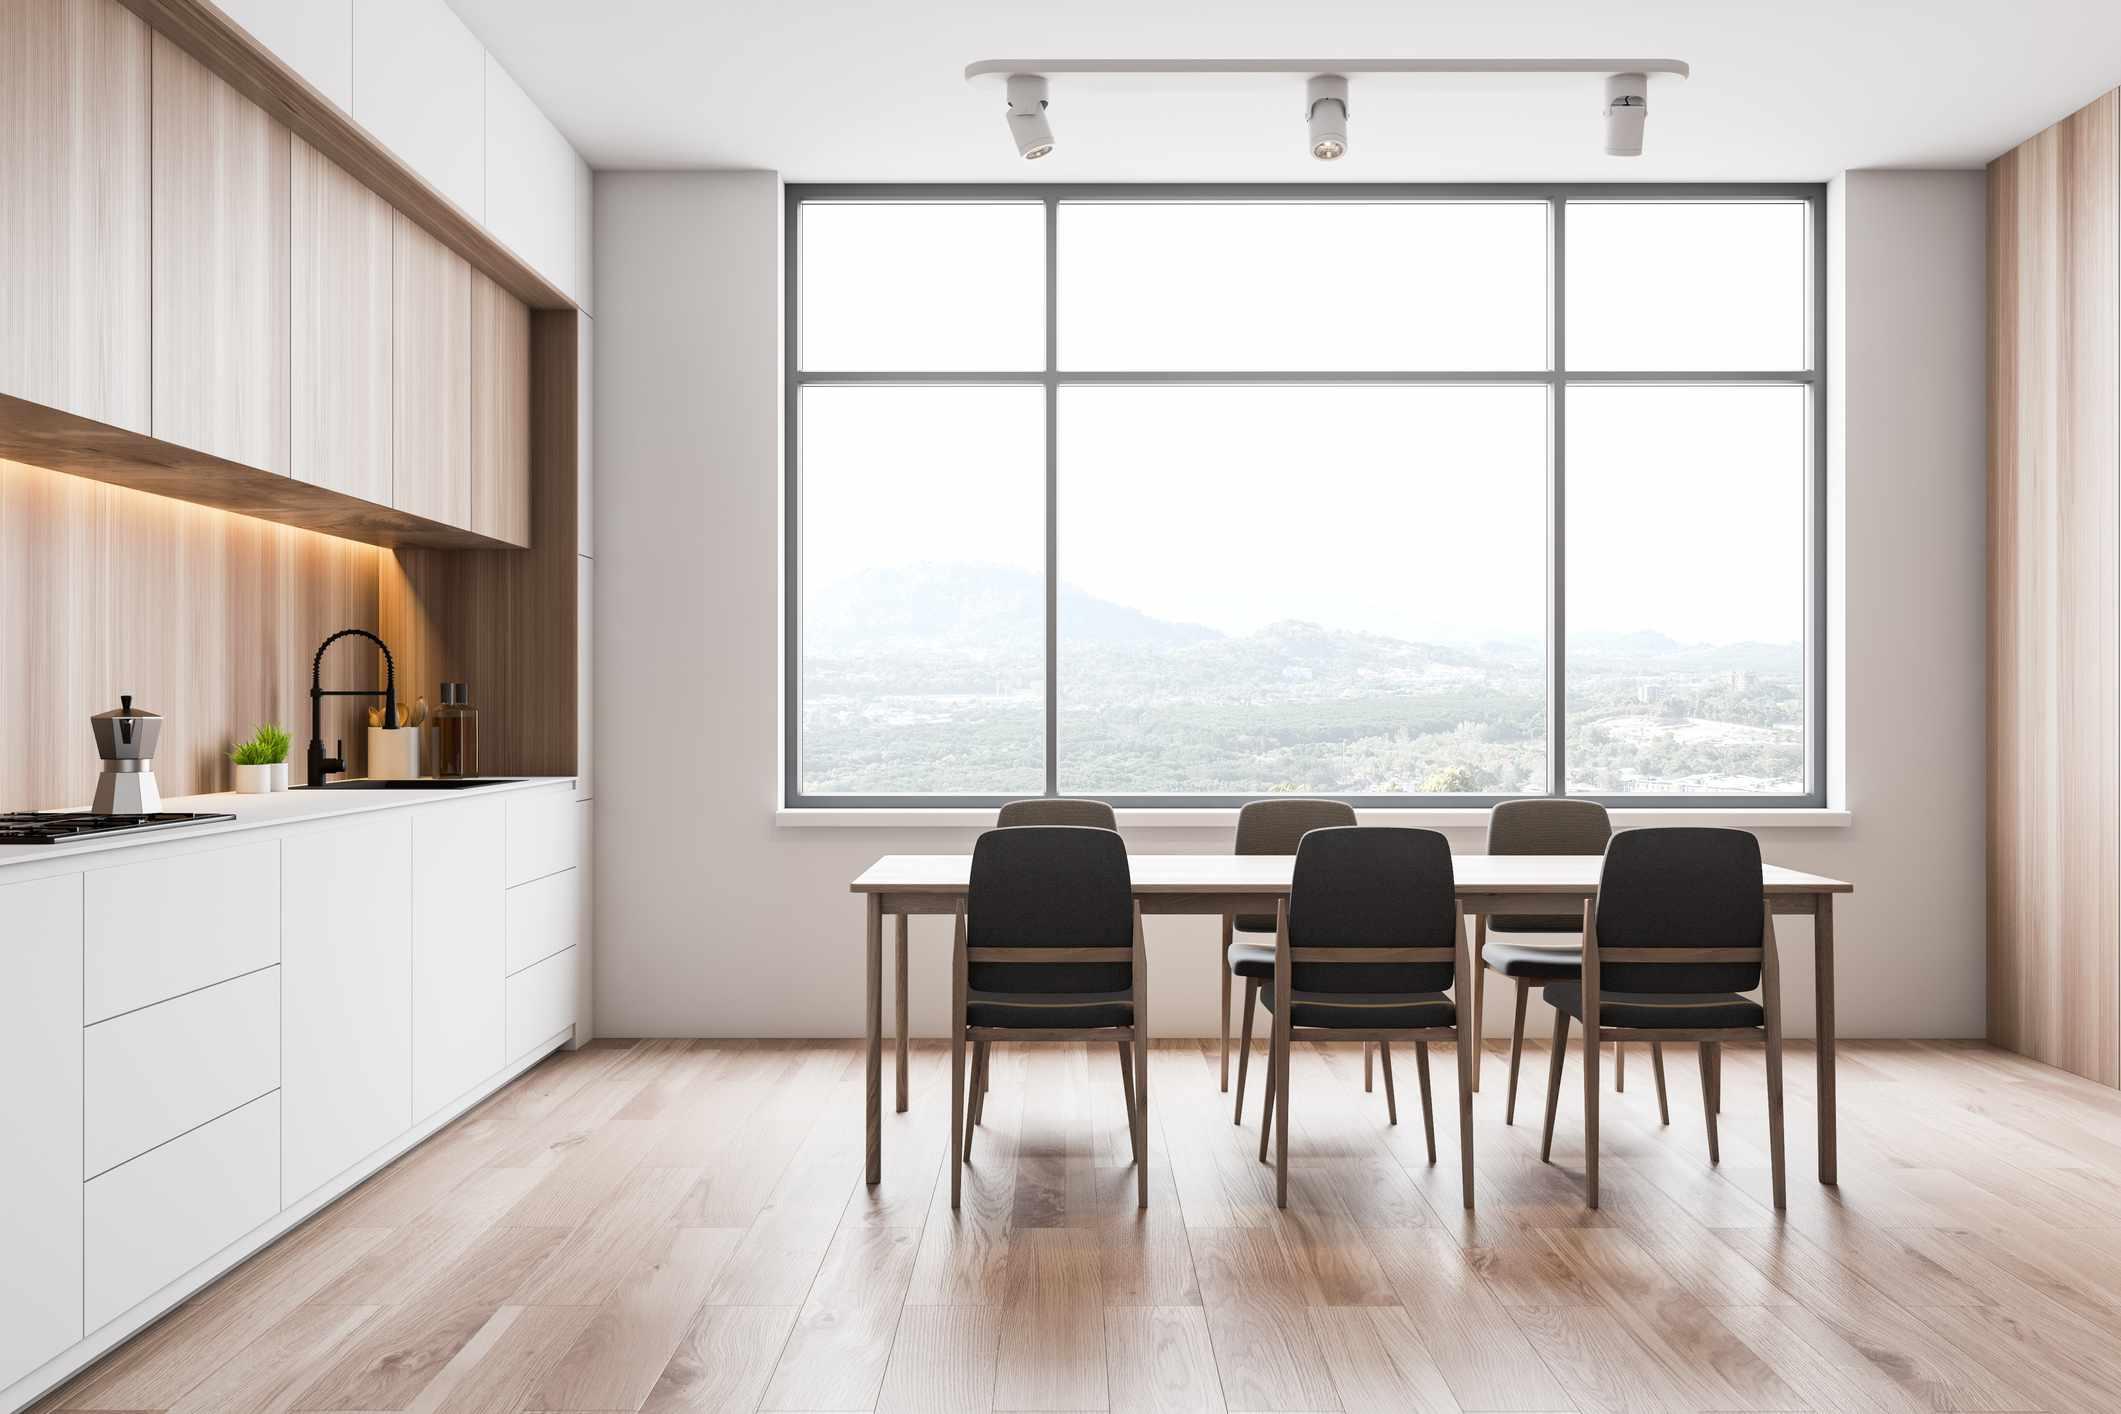 Minimalist wood kitchen backsplash